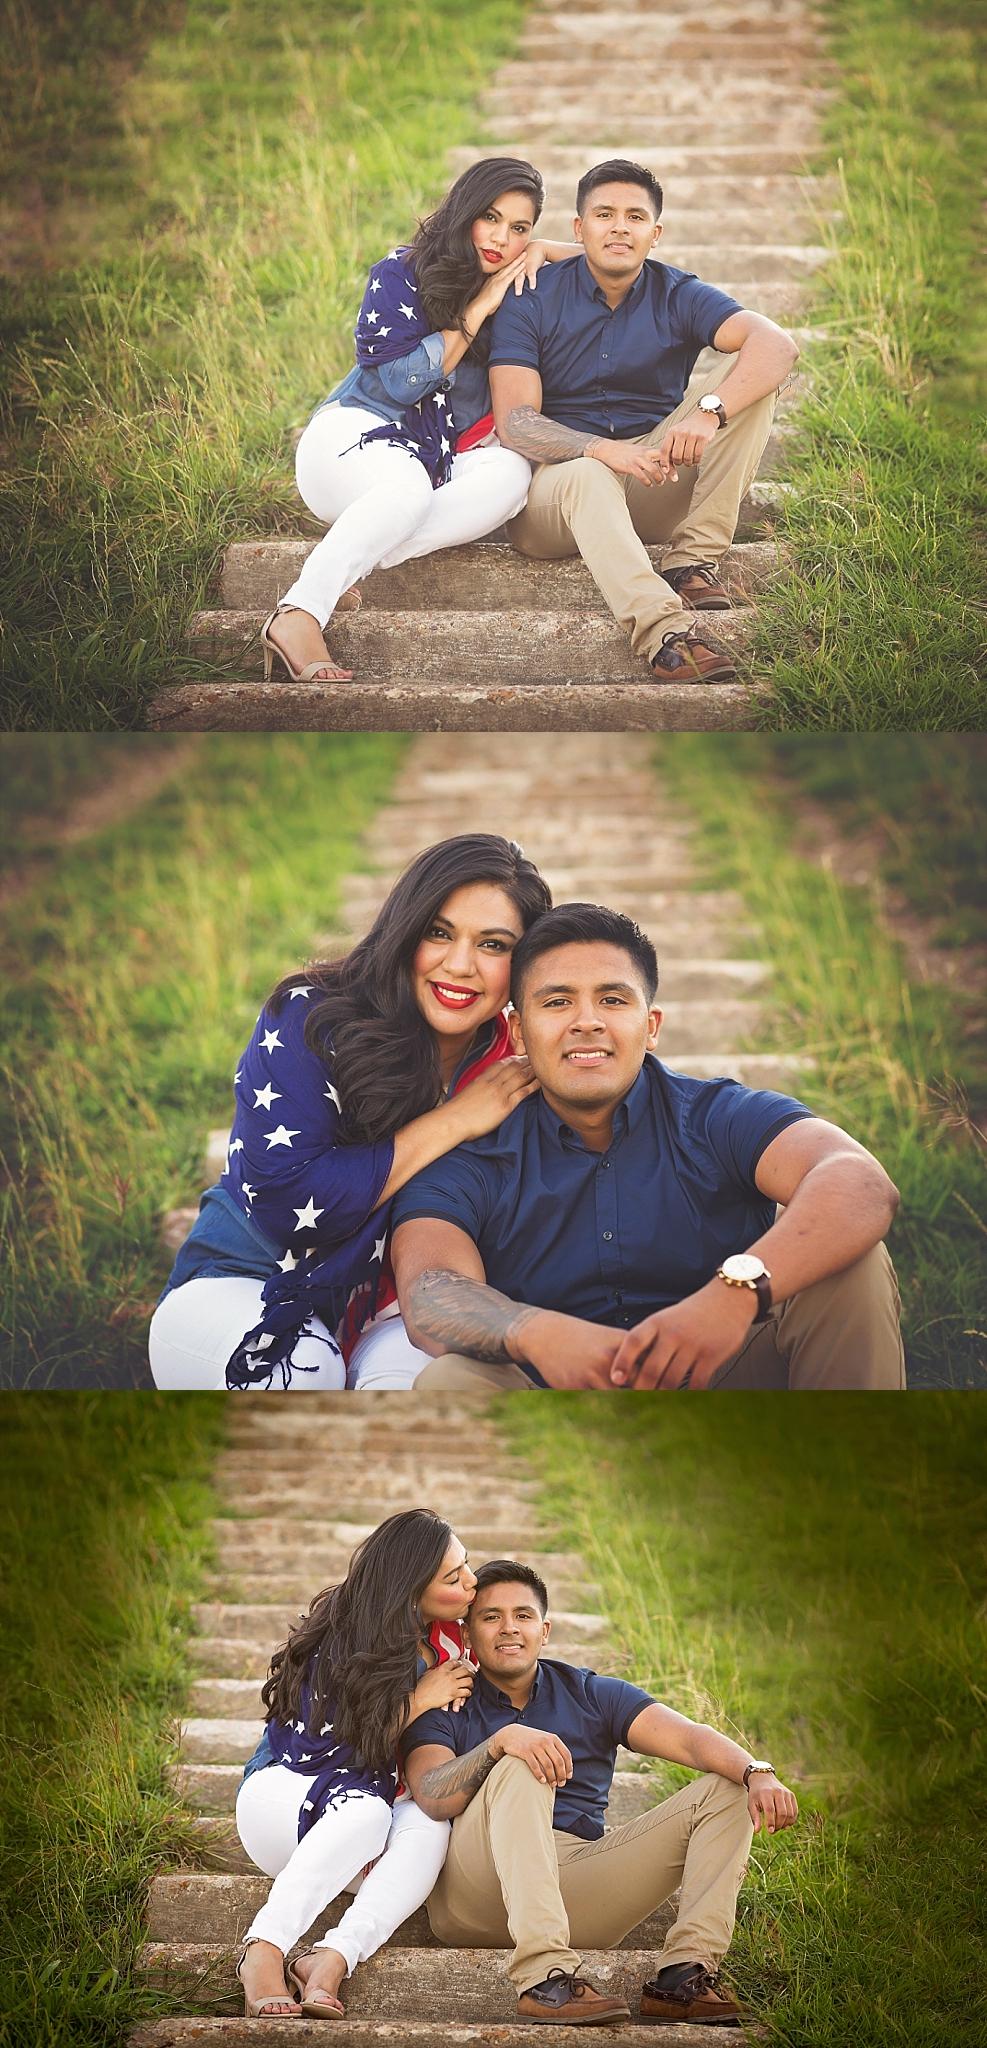 Patriotic family houston texas